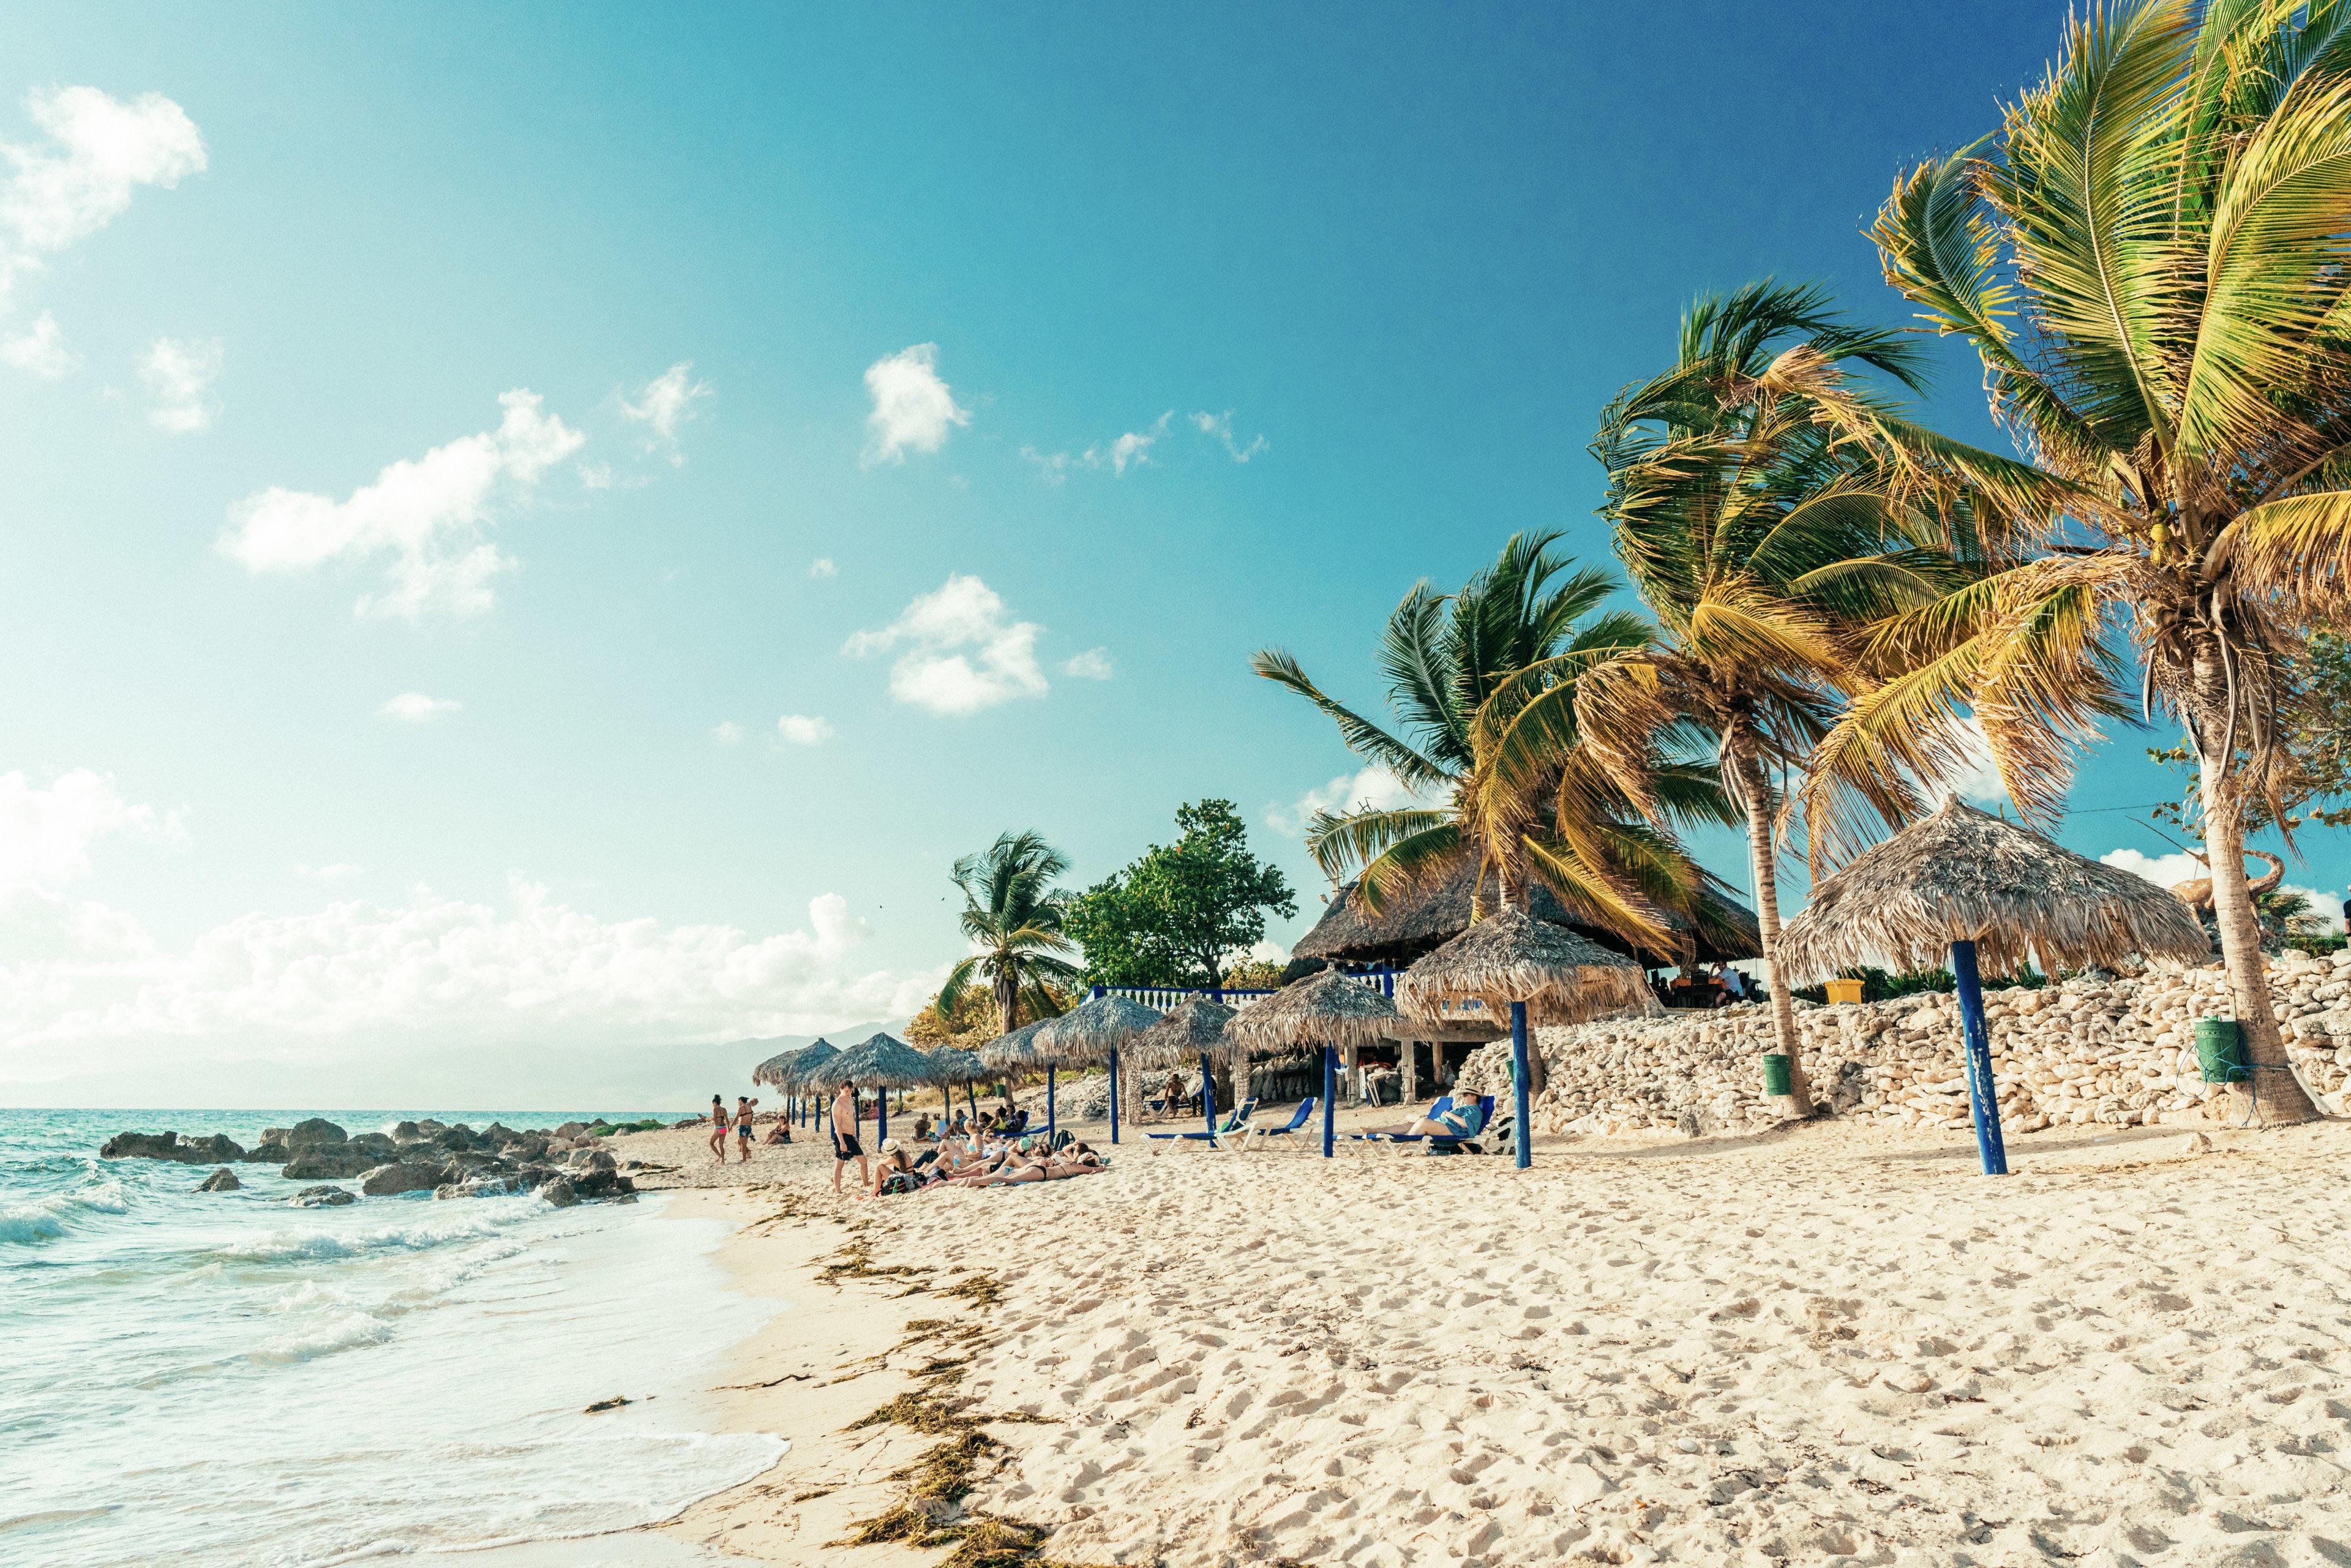 Strand mit Palmen in Kuba